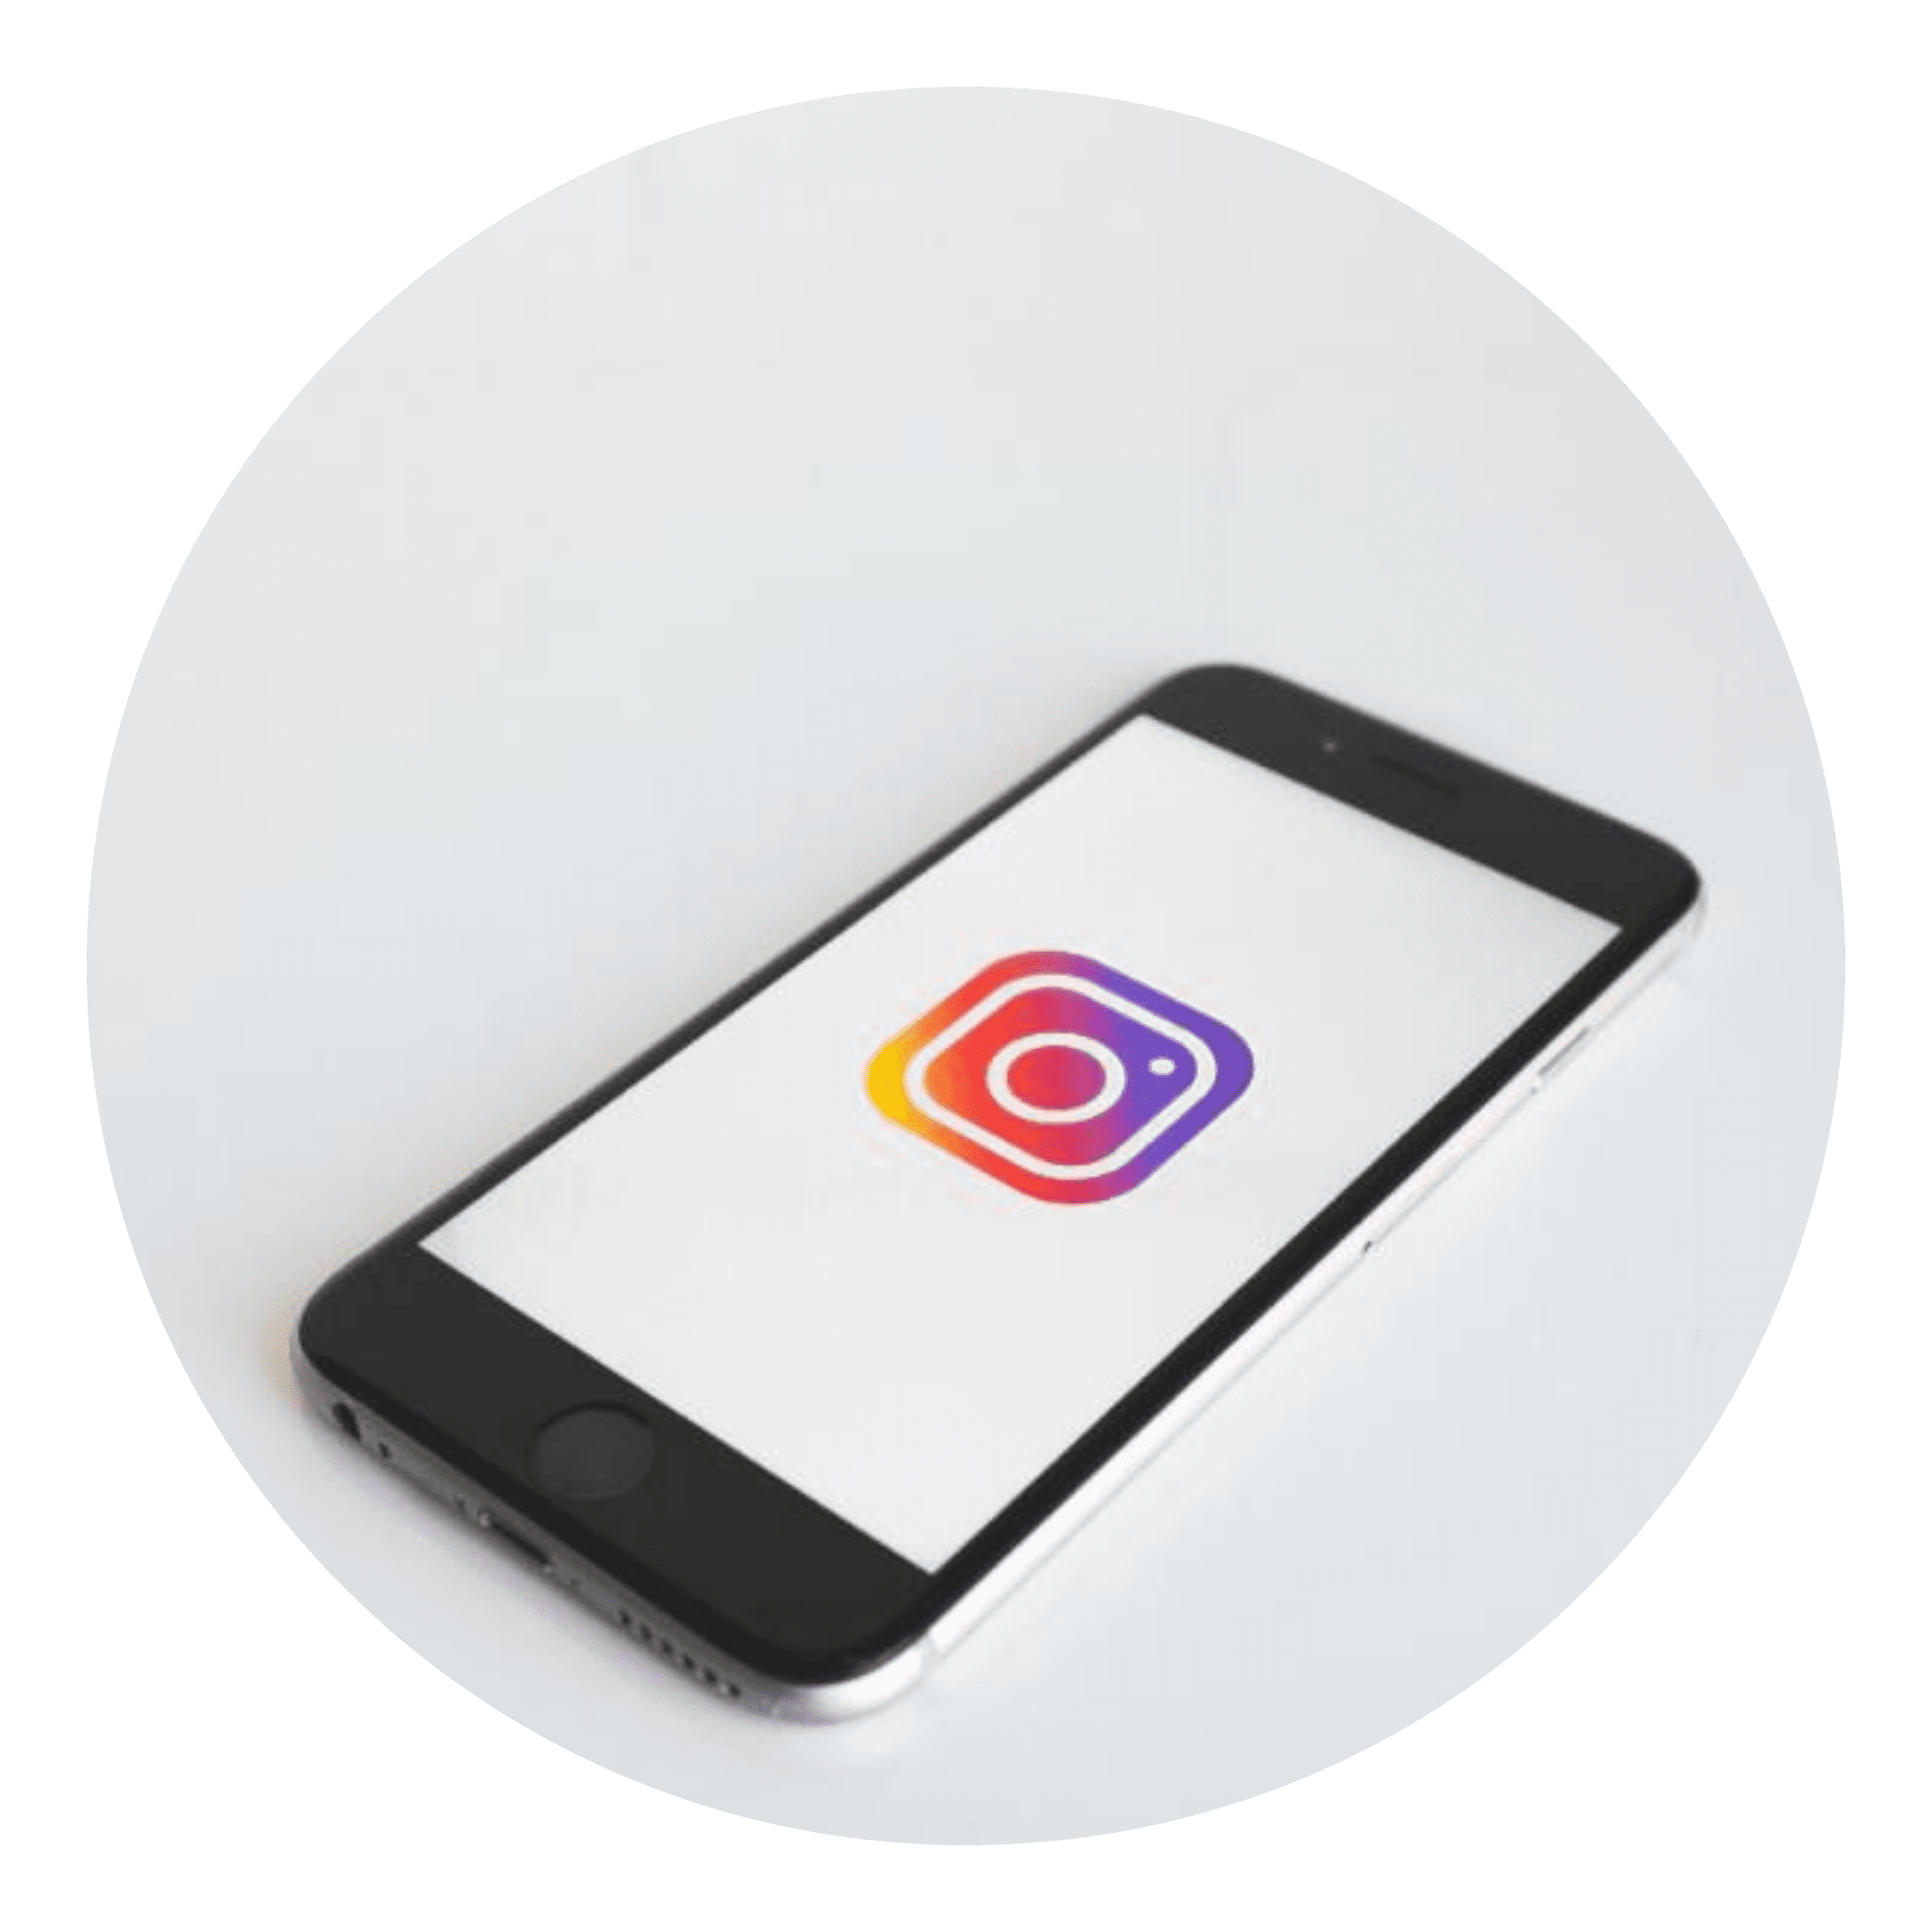 Mobiele telefoon met Instagram icoontje